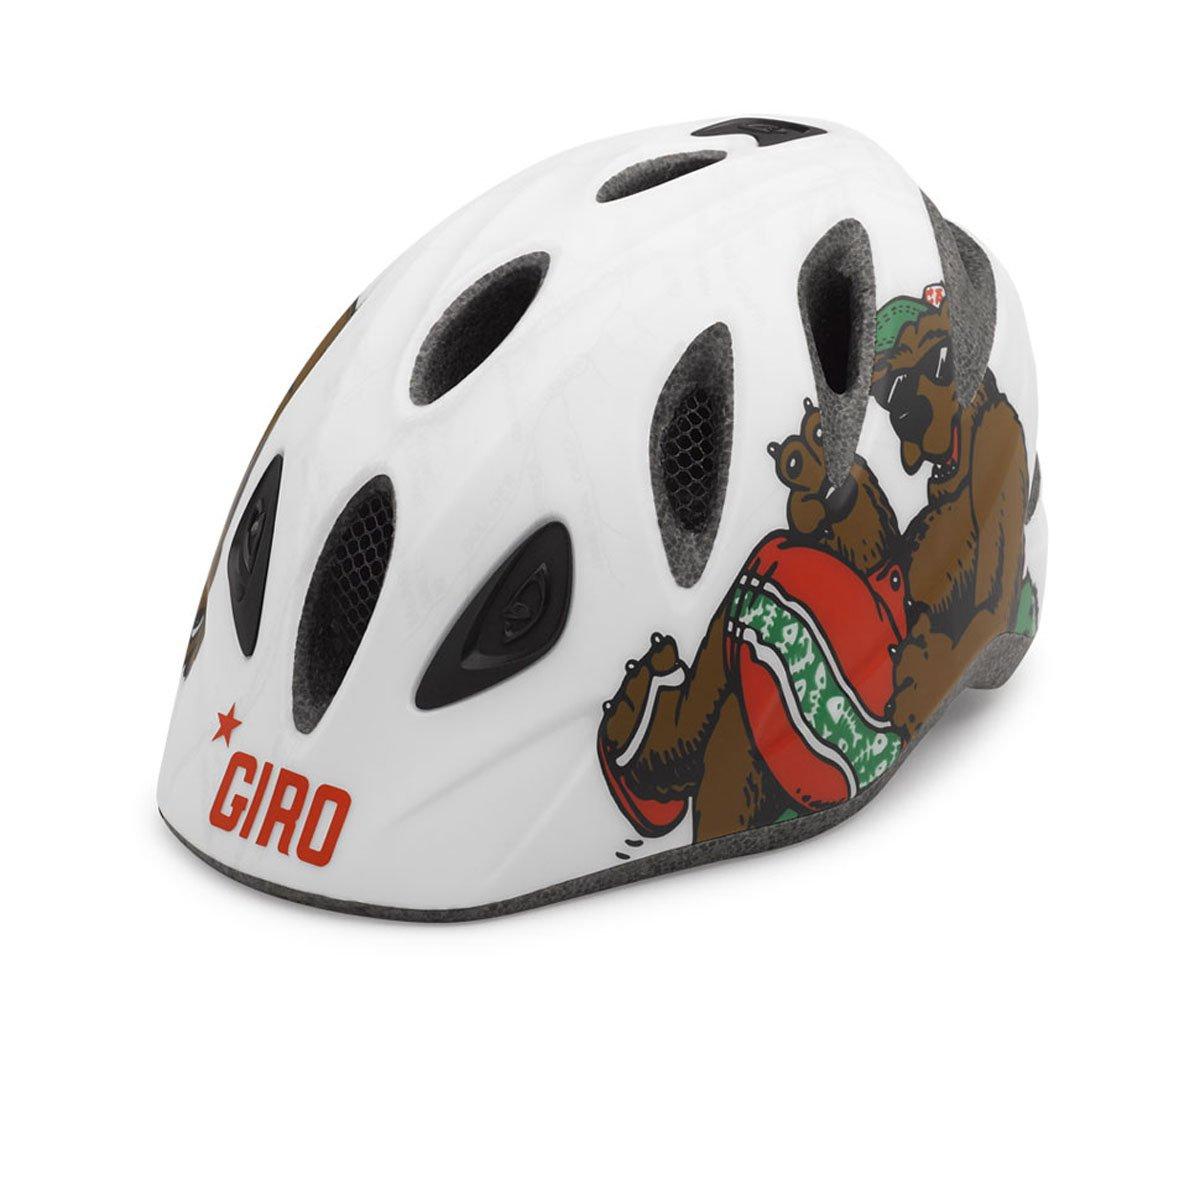 Giro Youth Rascal, CA Matte White CA Rascal, Bear - S White/M by Giro B00N1ALC4O, インポートアパレルのLa Vida:ac54a827 --- xn--navi-zs5fv20egkuitb915c6nrjq3bzff.club